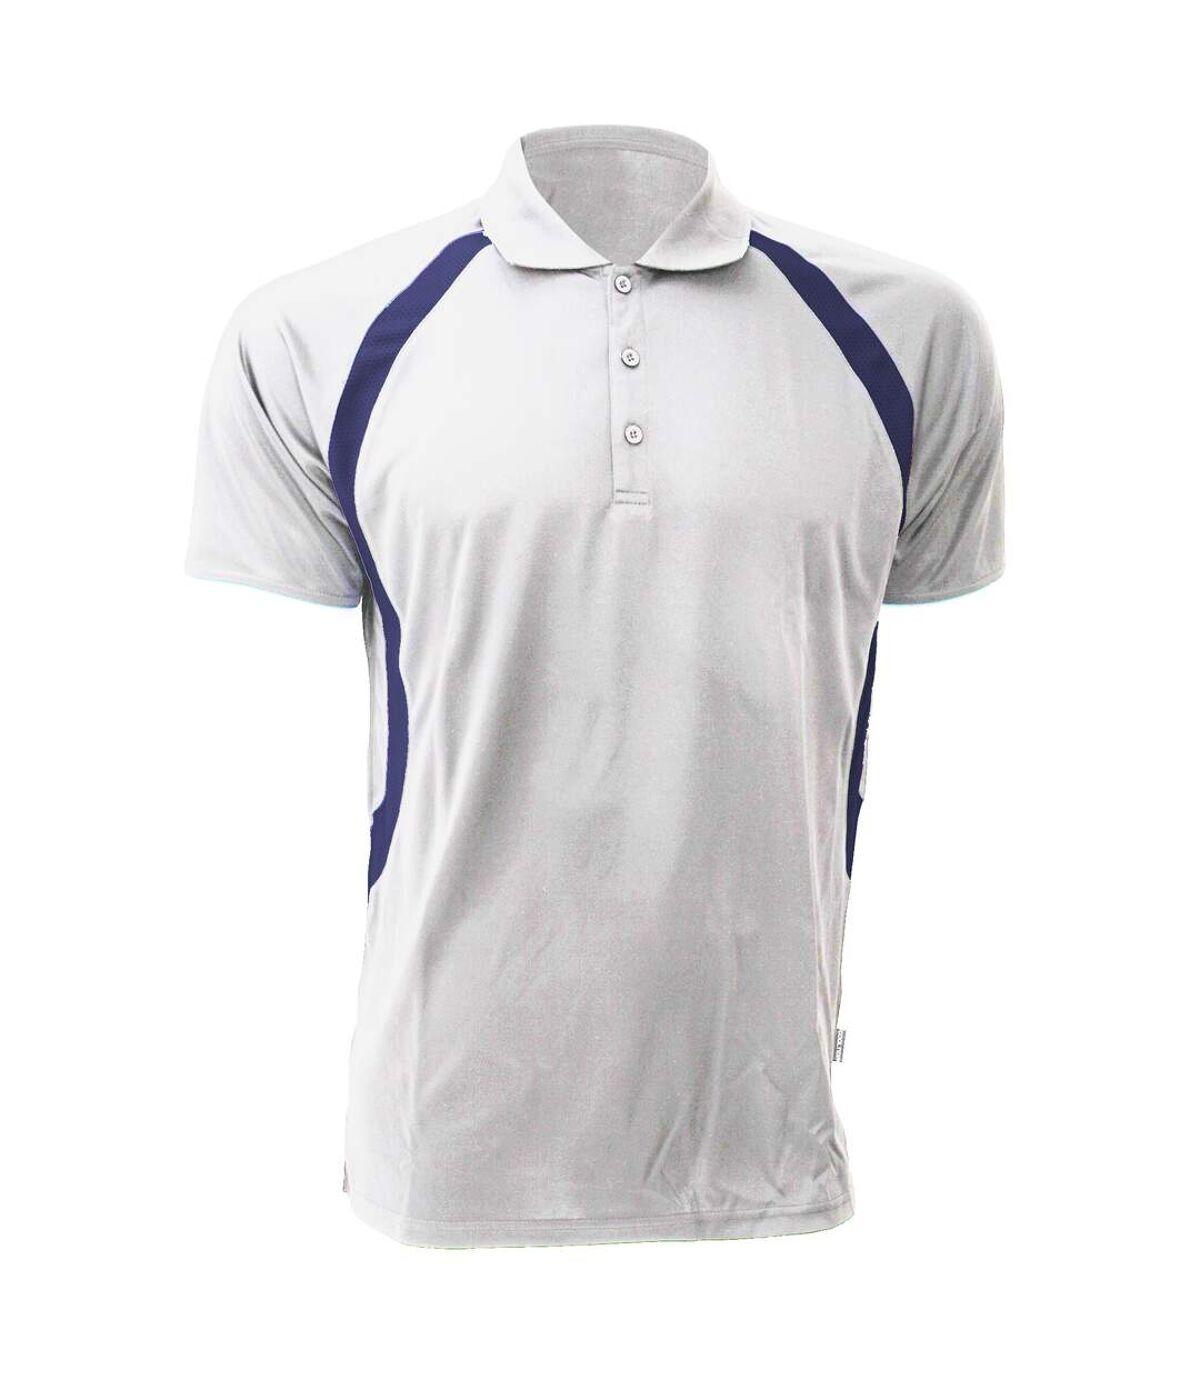 Gamegear® Mens Cooltex® Riviera Polo Shirt / Mens Sportswear (White/Navy) - UTBC434